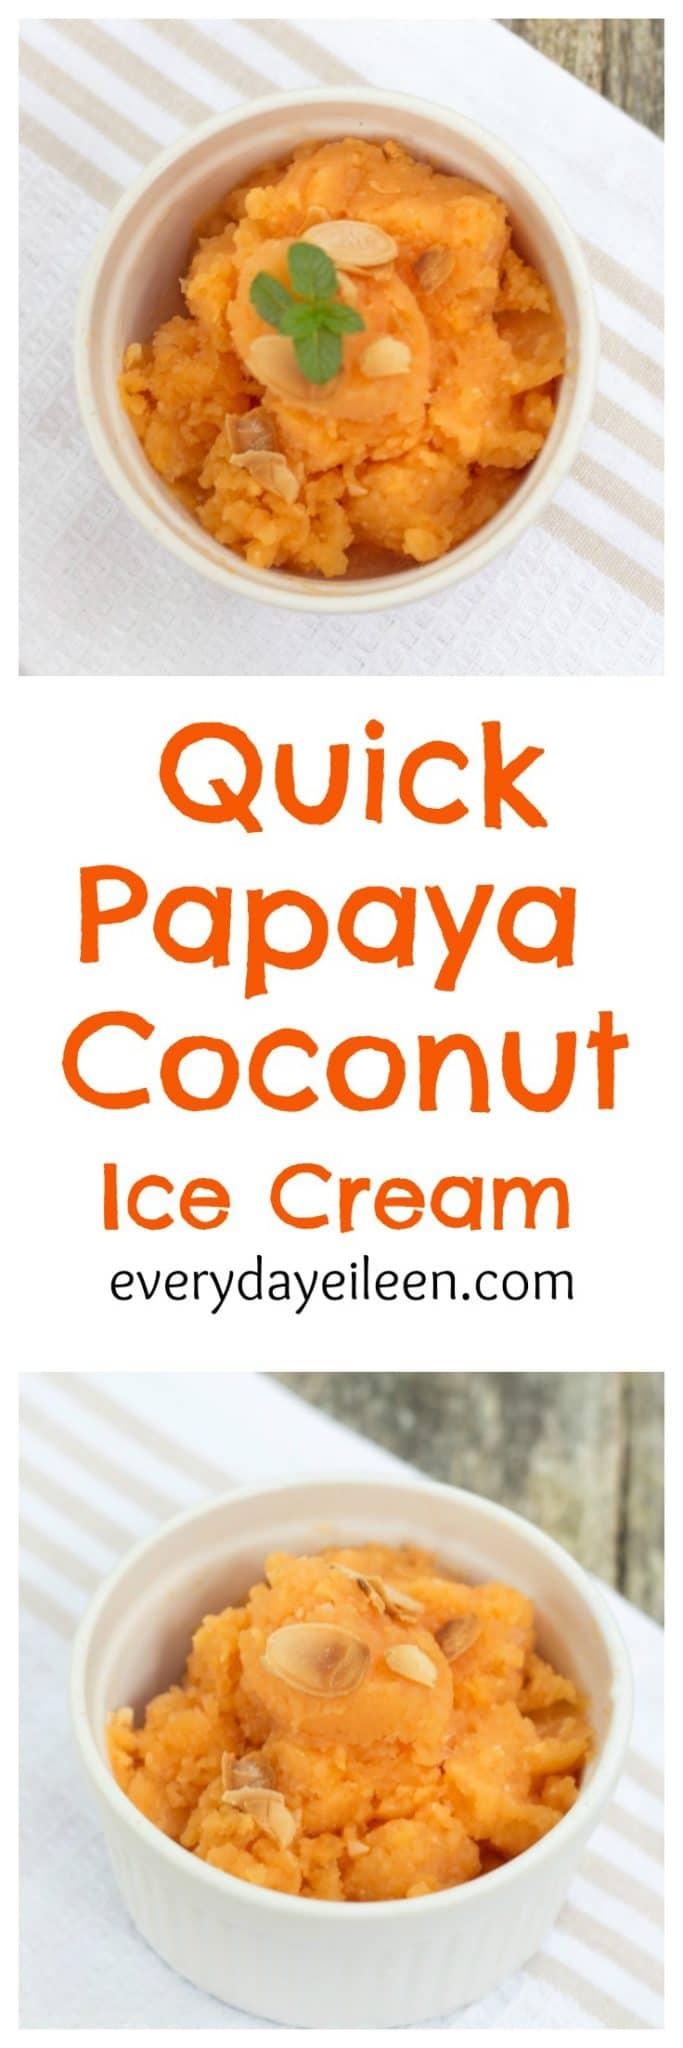 quick papaya coconut ice cream